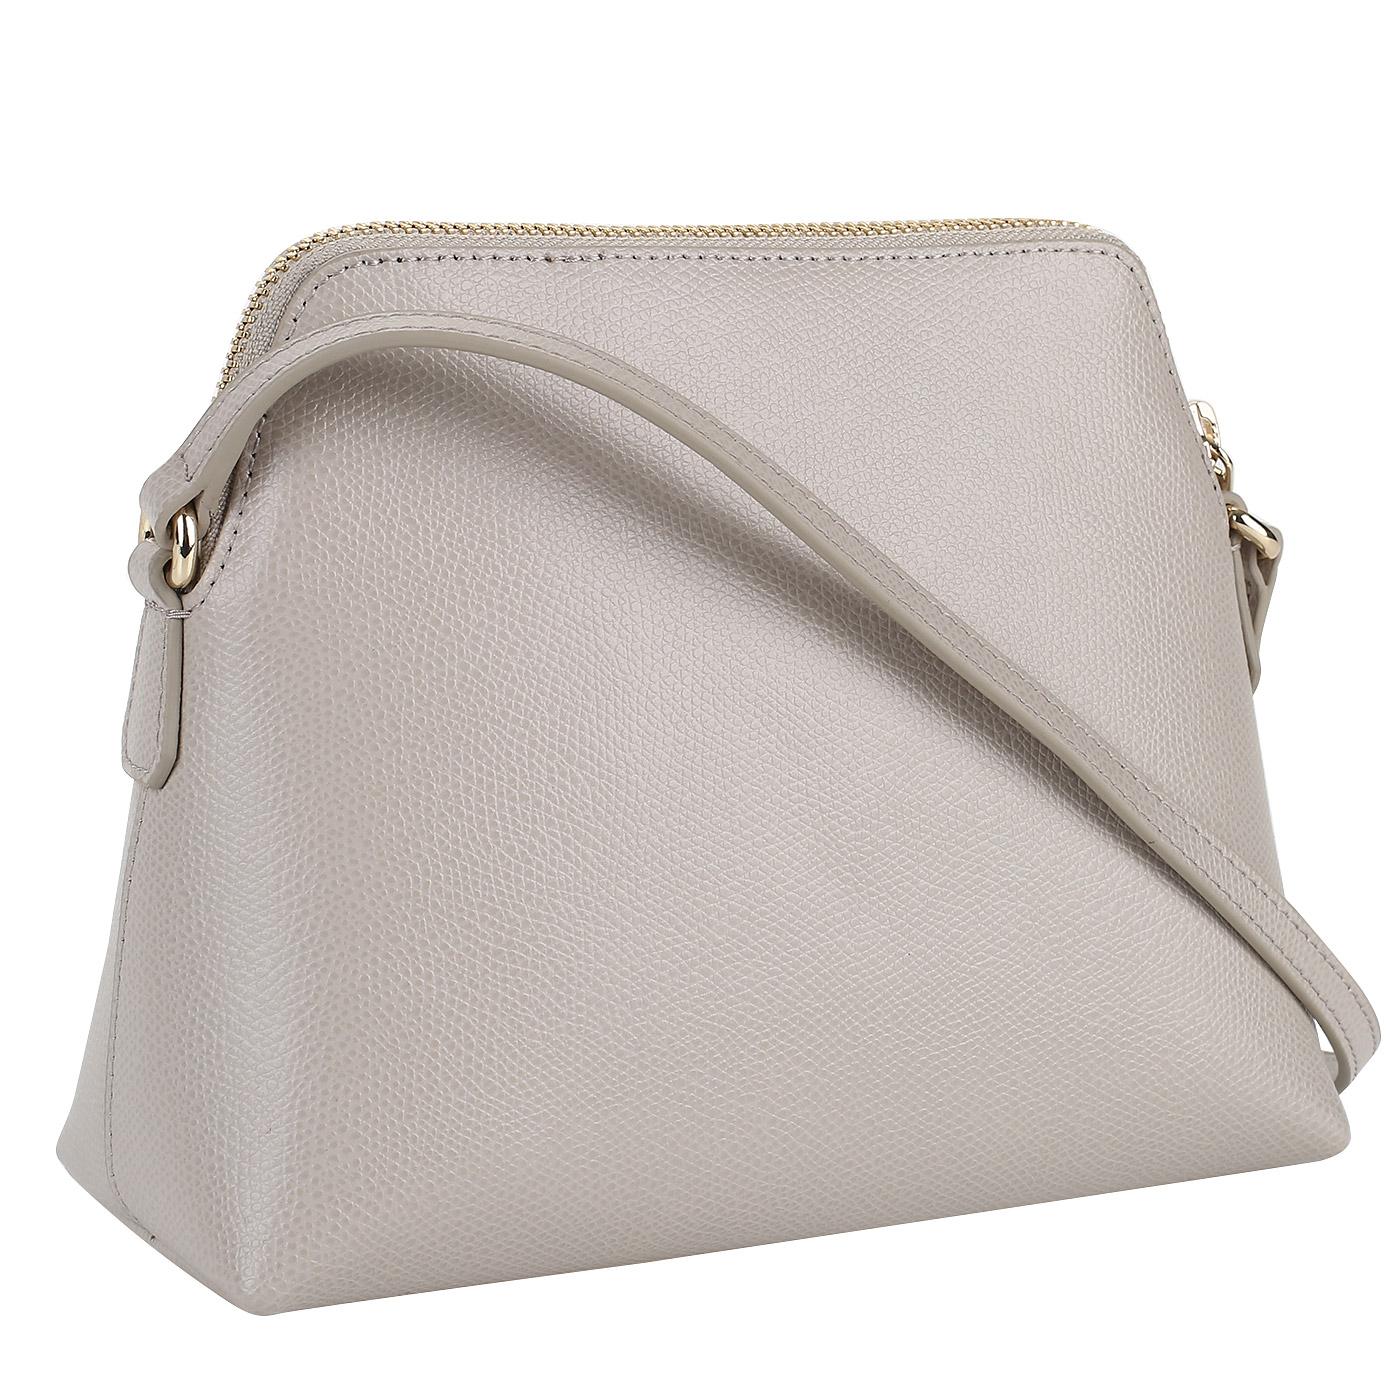 0aa61edabf85 Женская сумочка с косметичкой и визитницей Furla Boheme